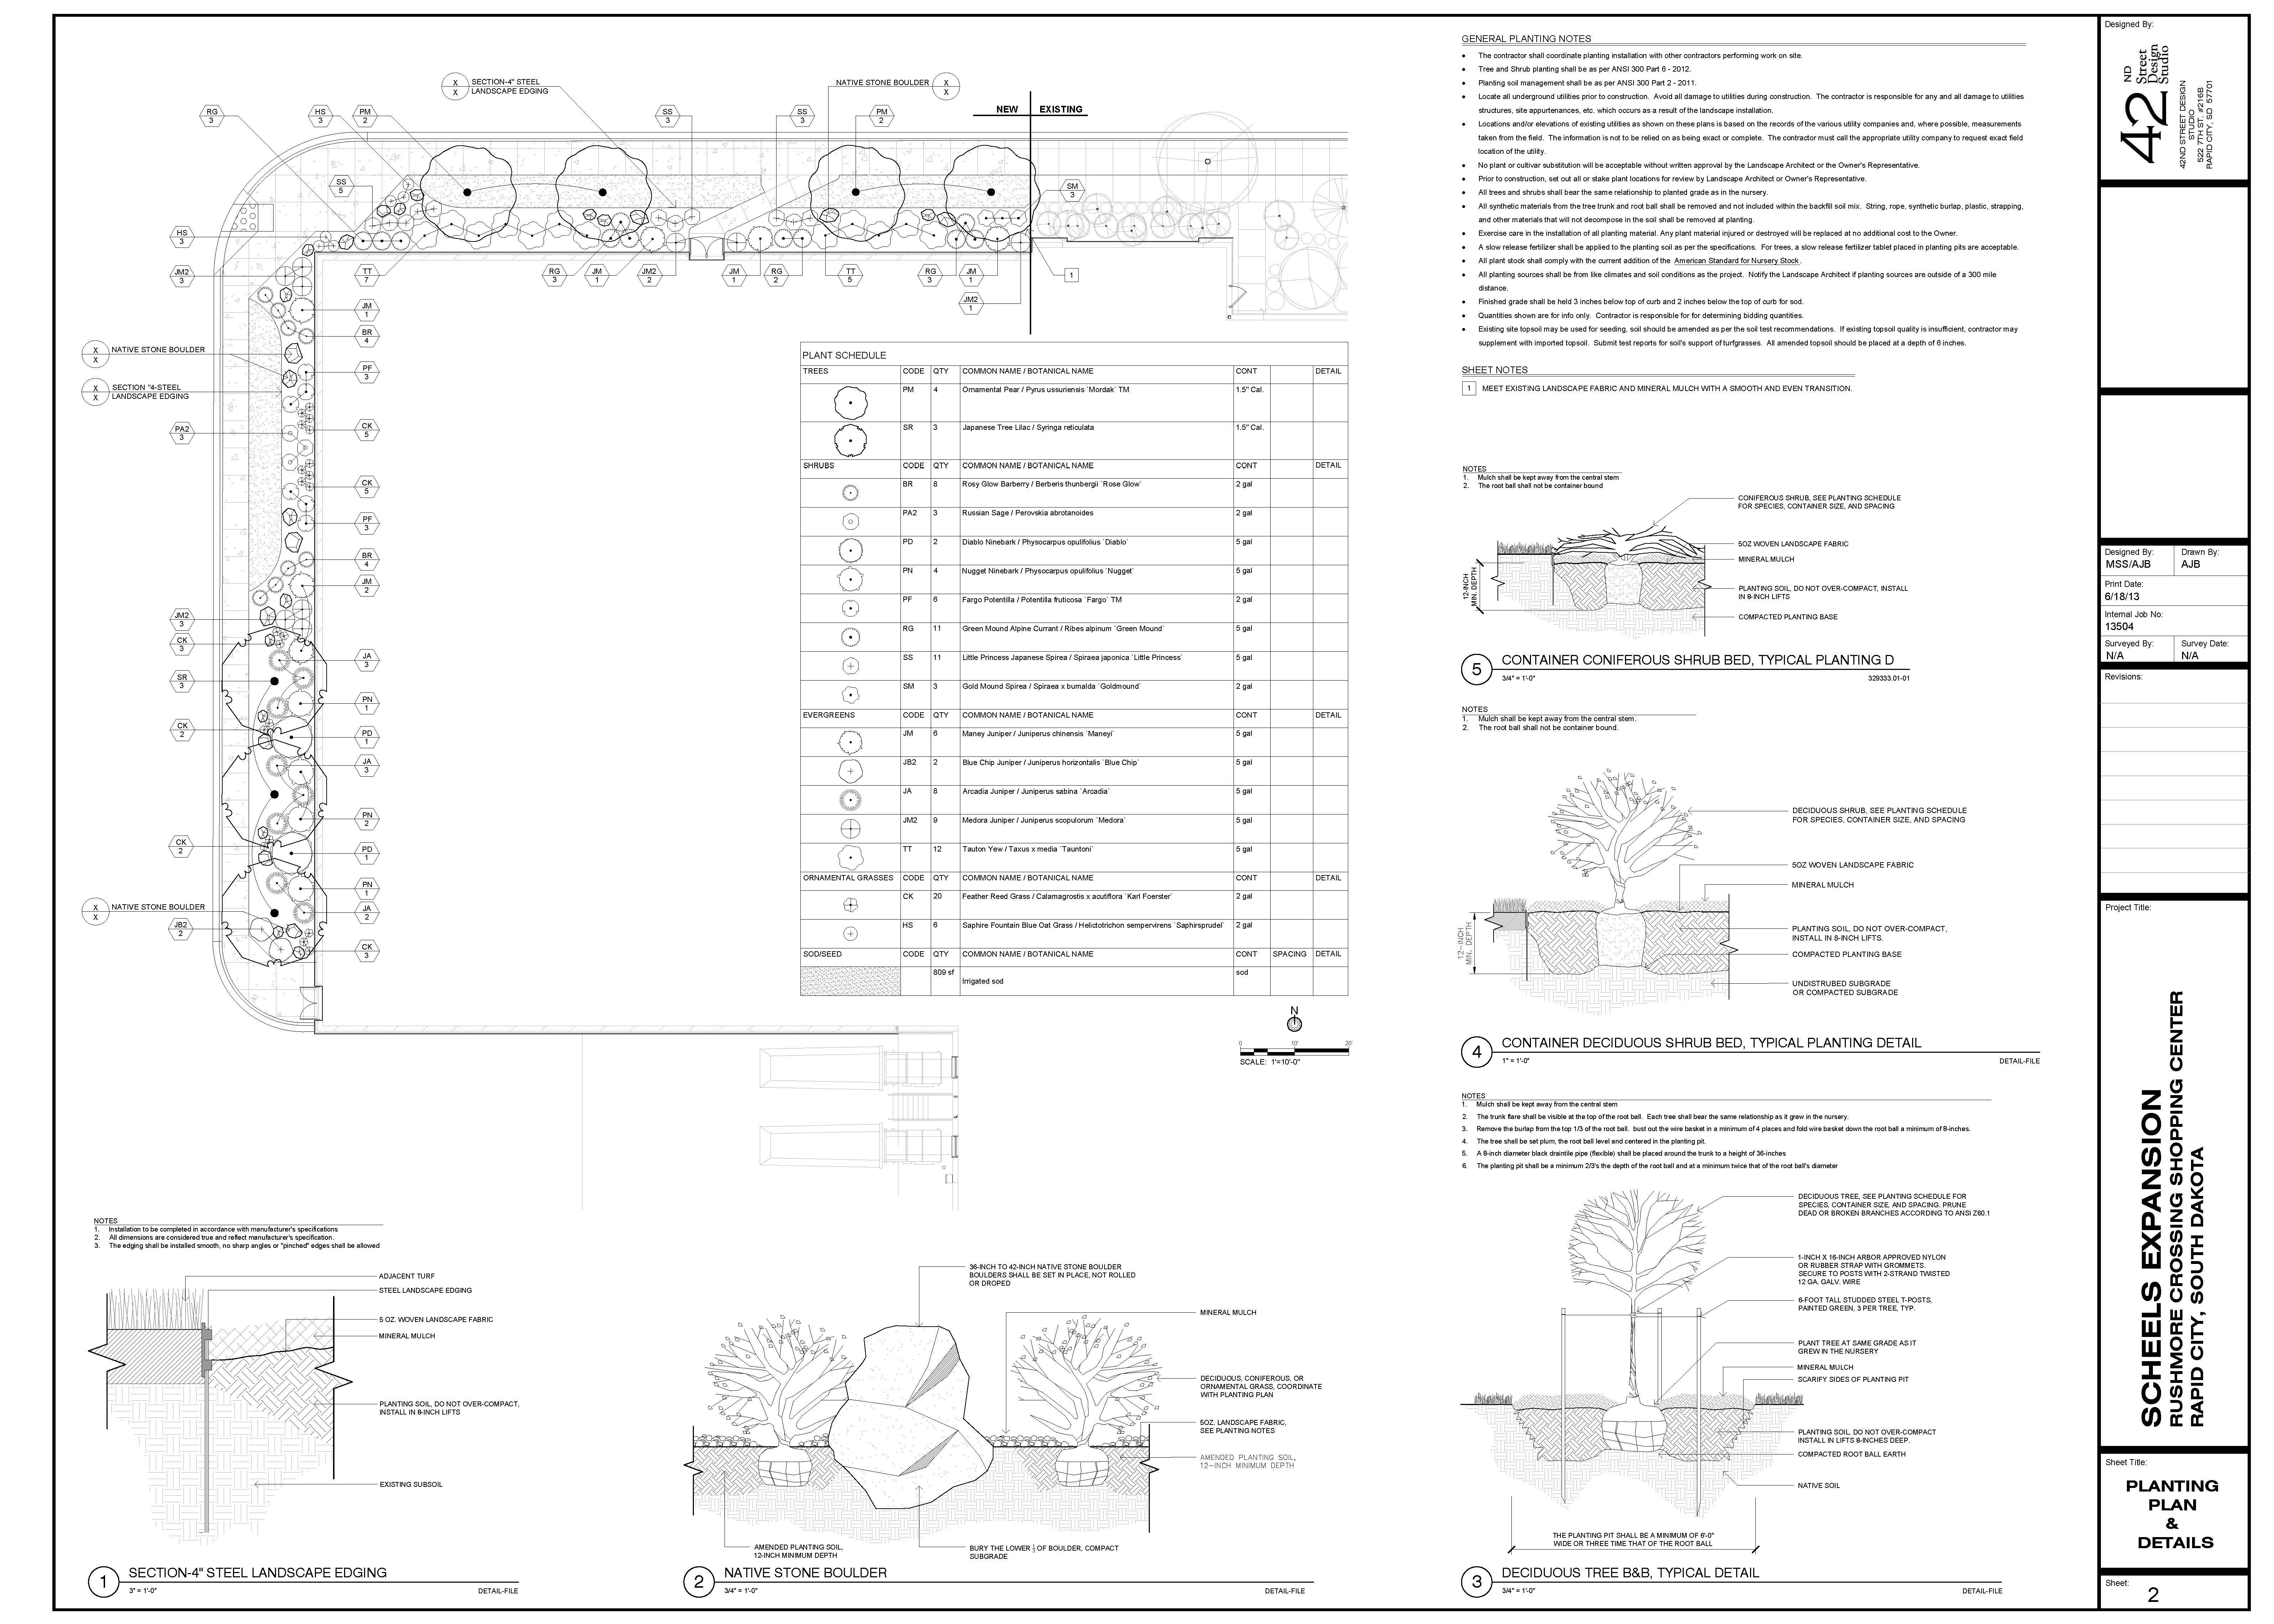 Planting Details